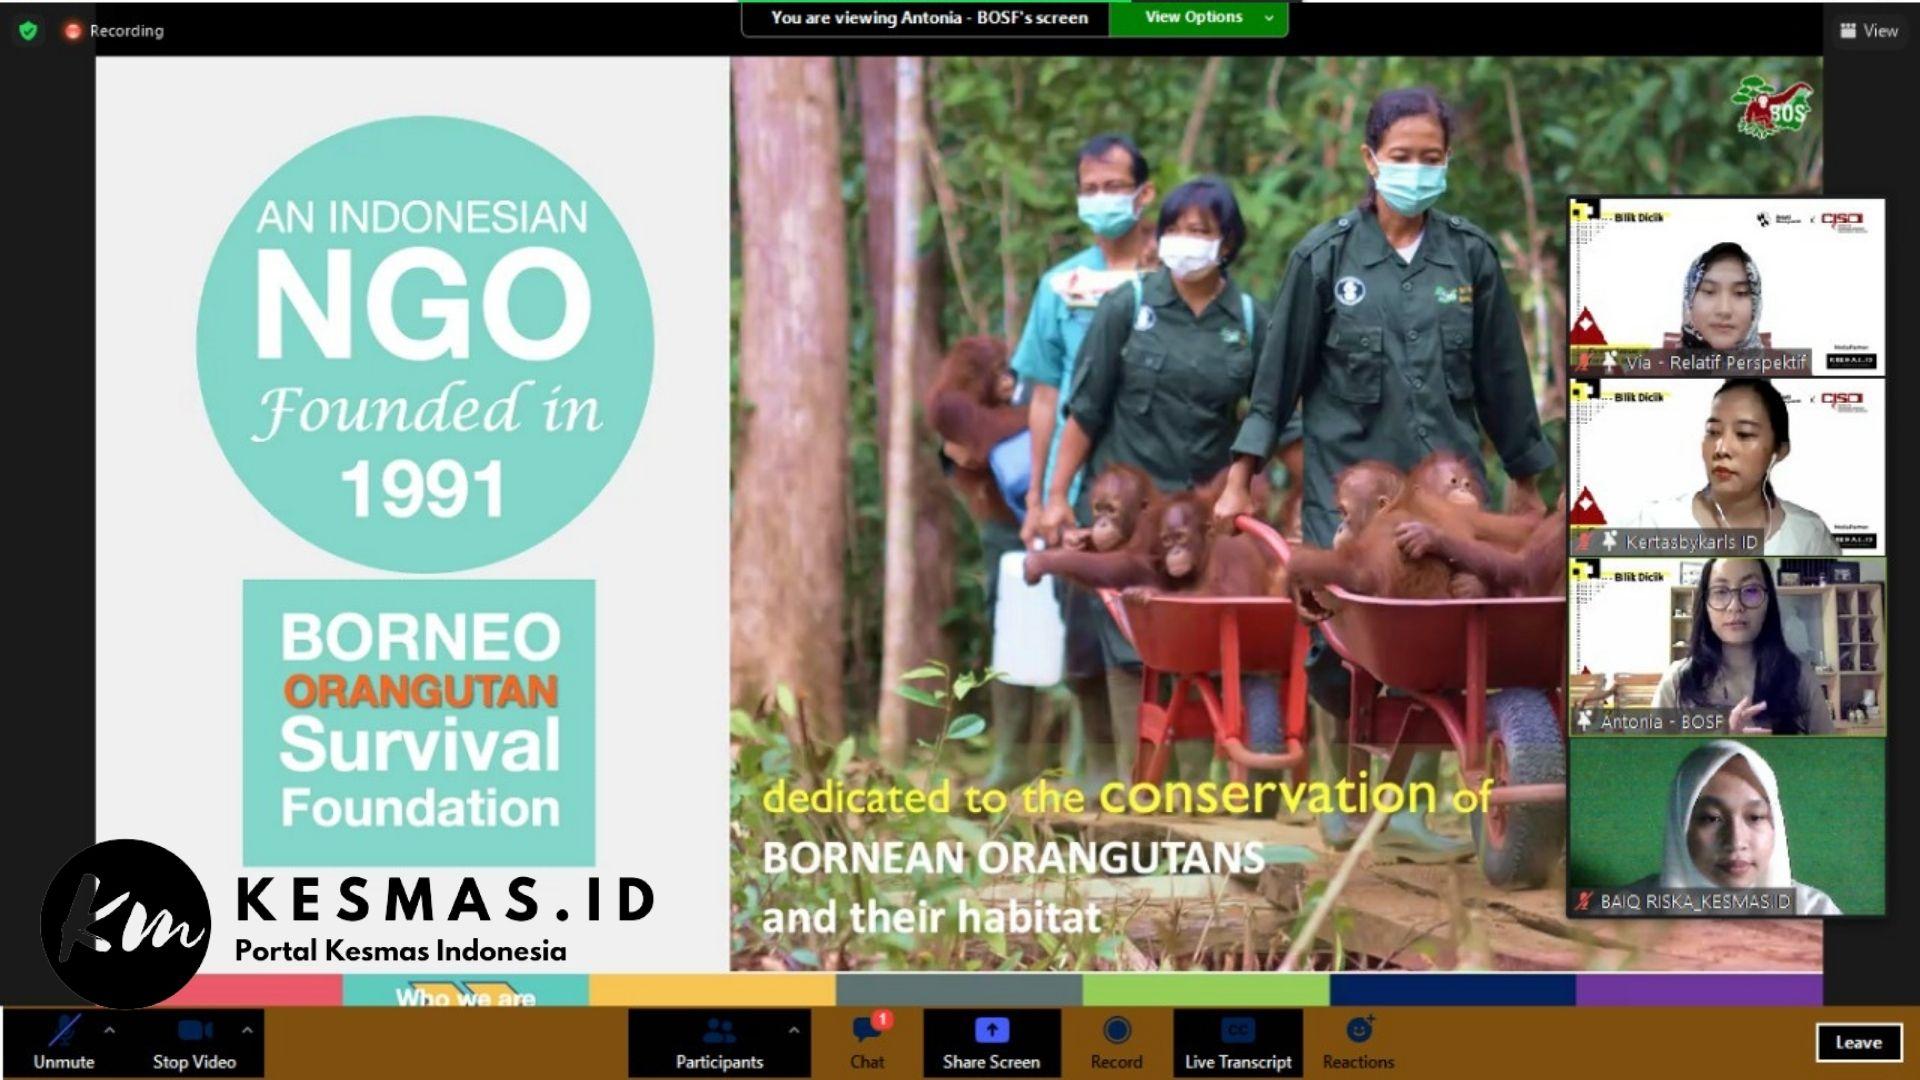 Yayasan BOSF (Borneo Orangutan Survival Foundation)